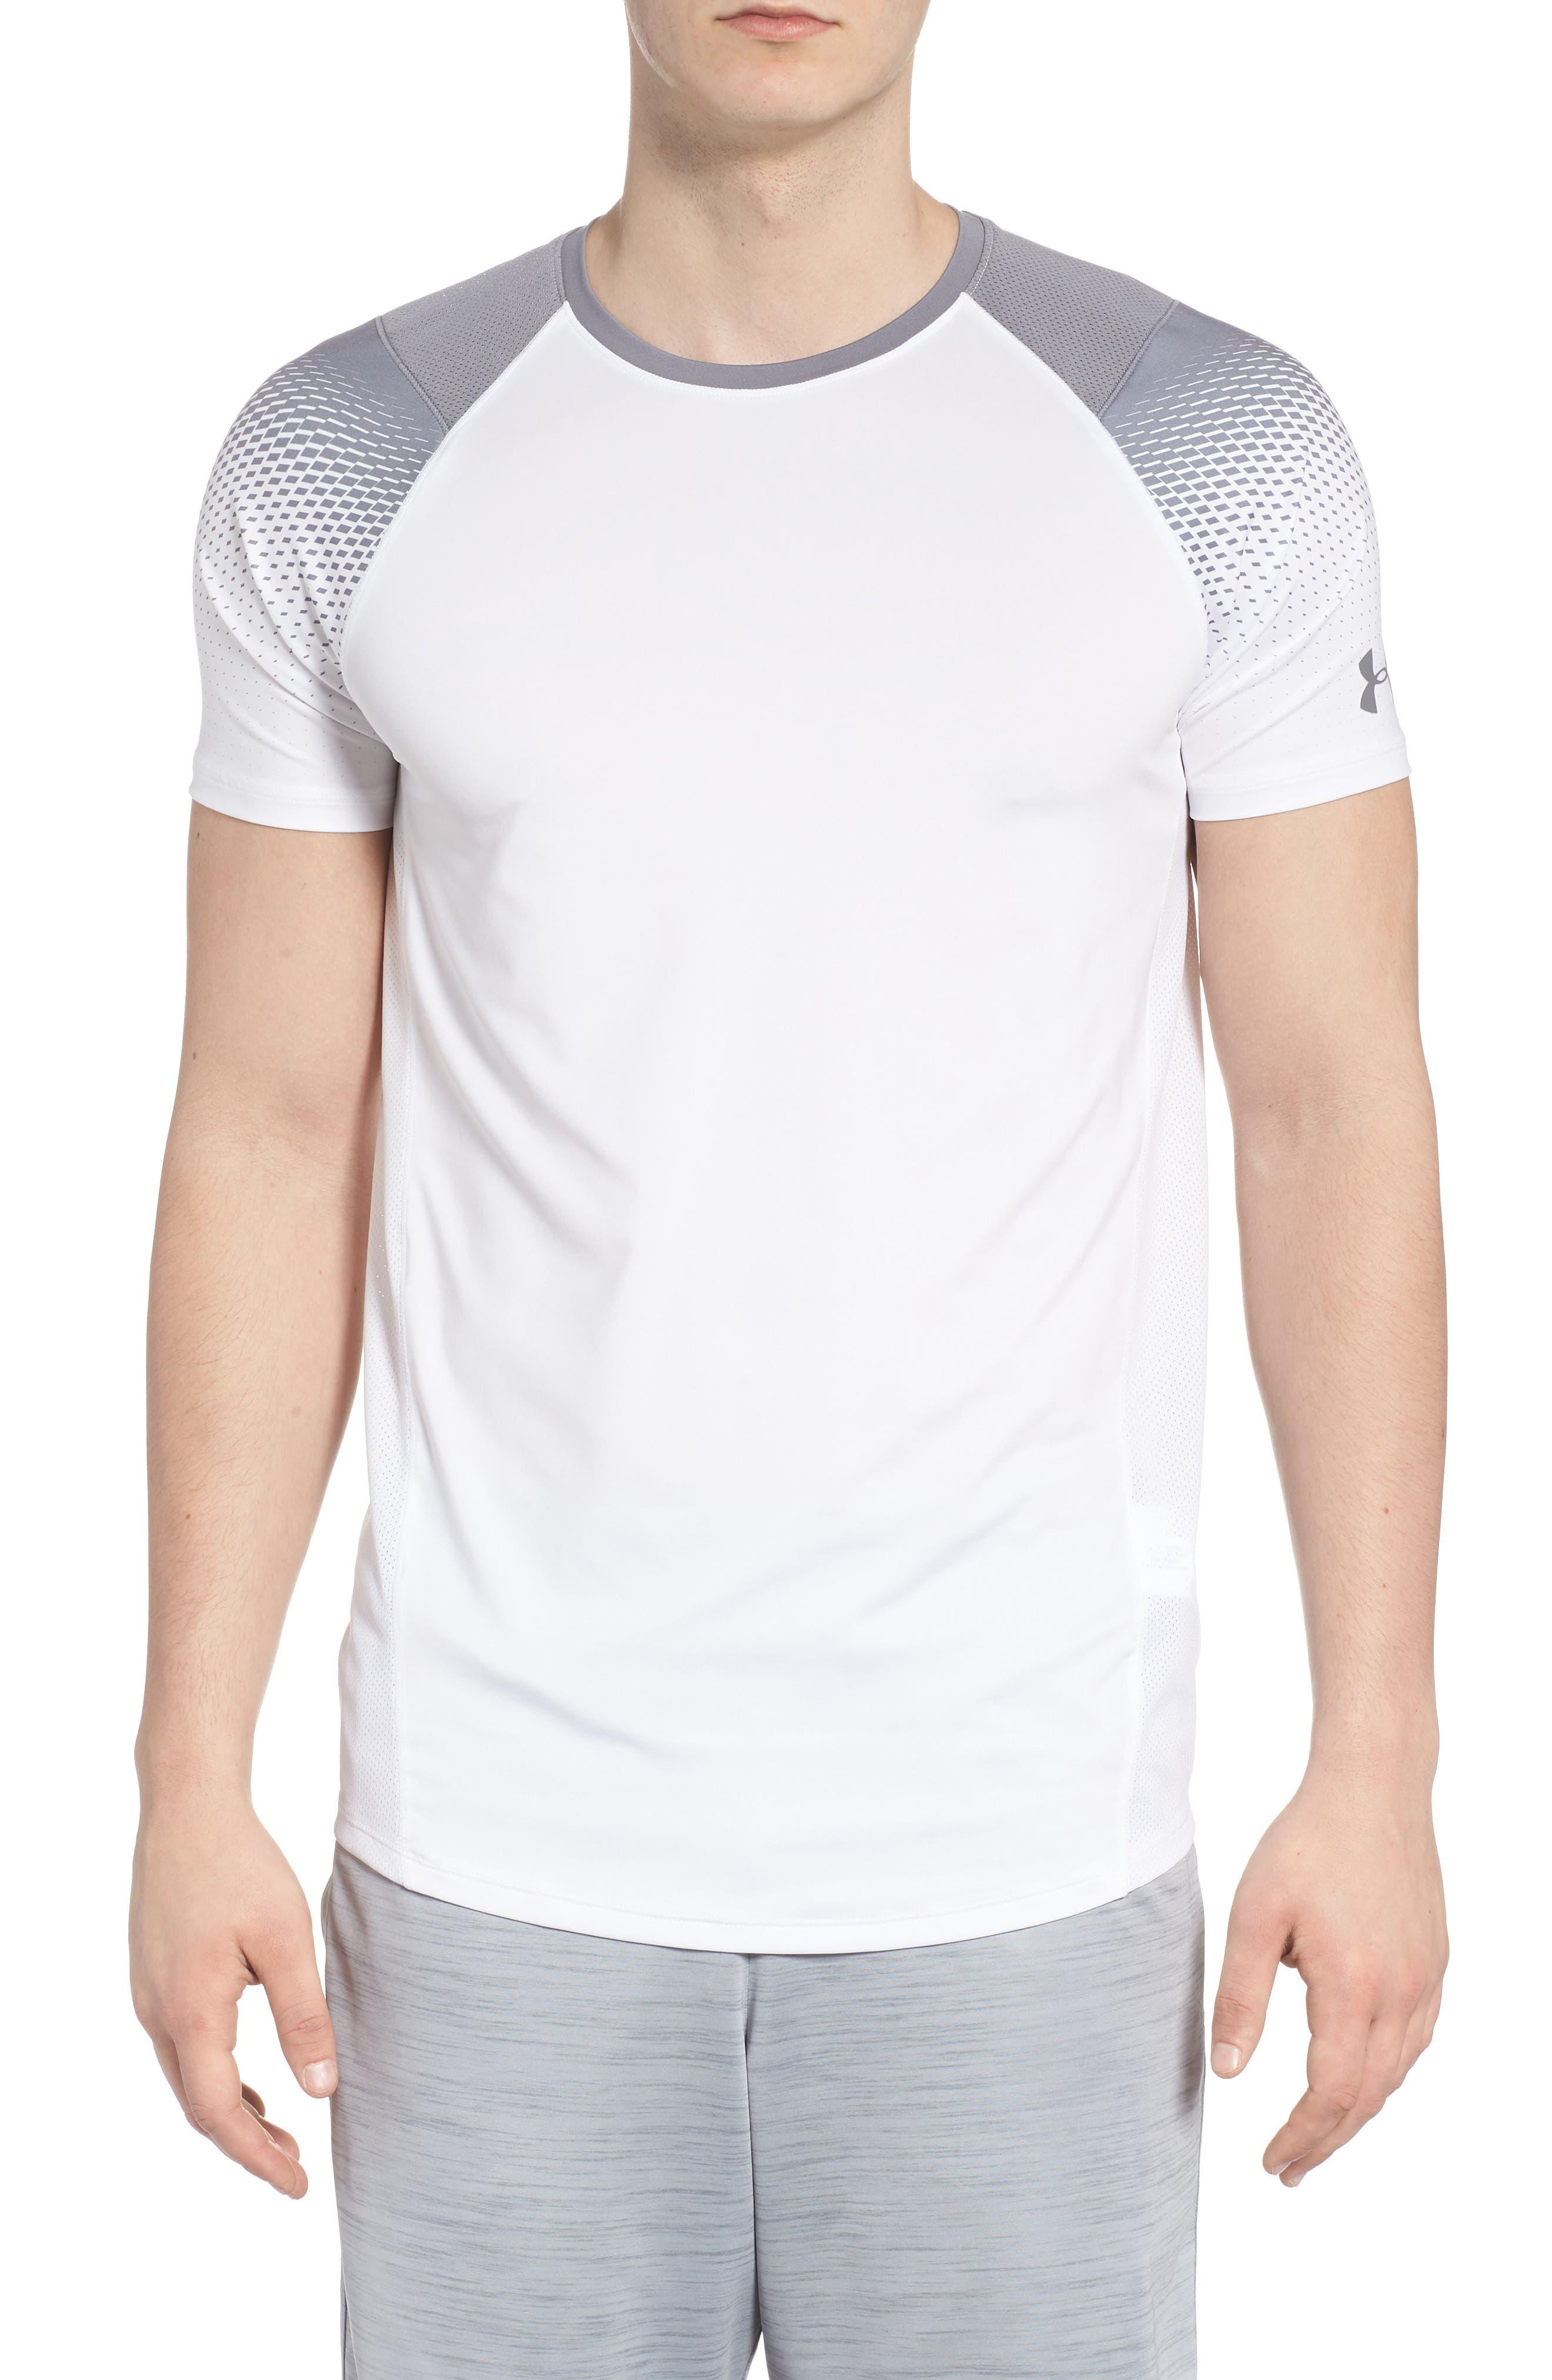 MK1 Dash Print Crewneck T-Shirt,                         Main,                         color, WHITE / ZINC GREH / GRAPHITE